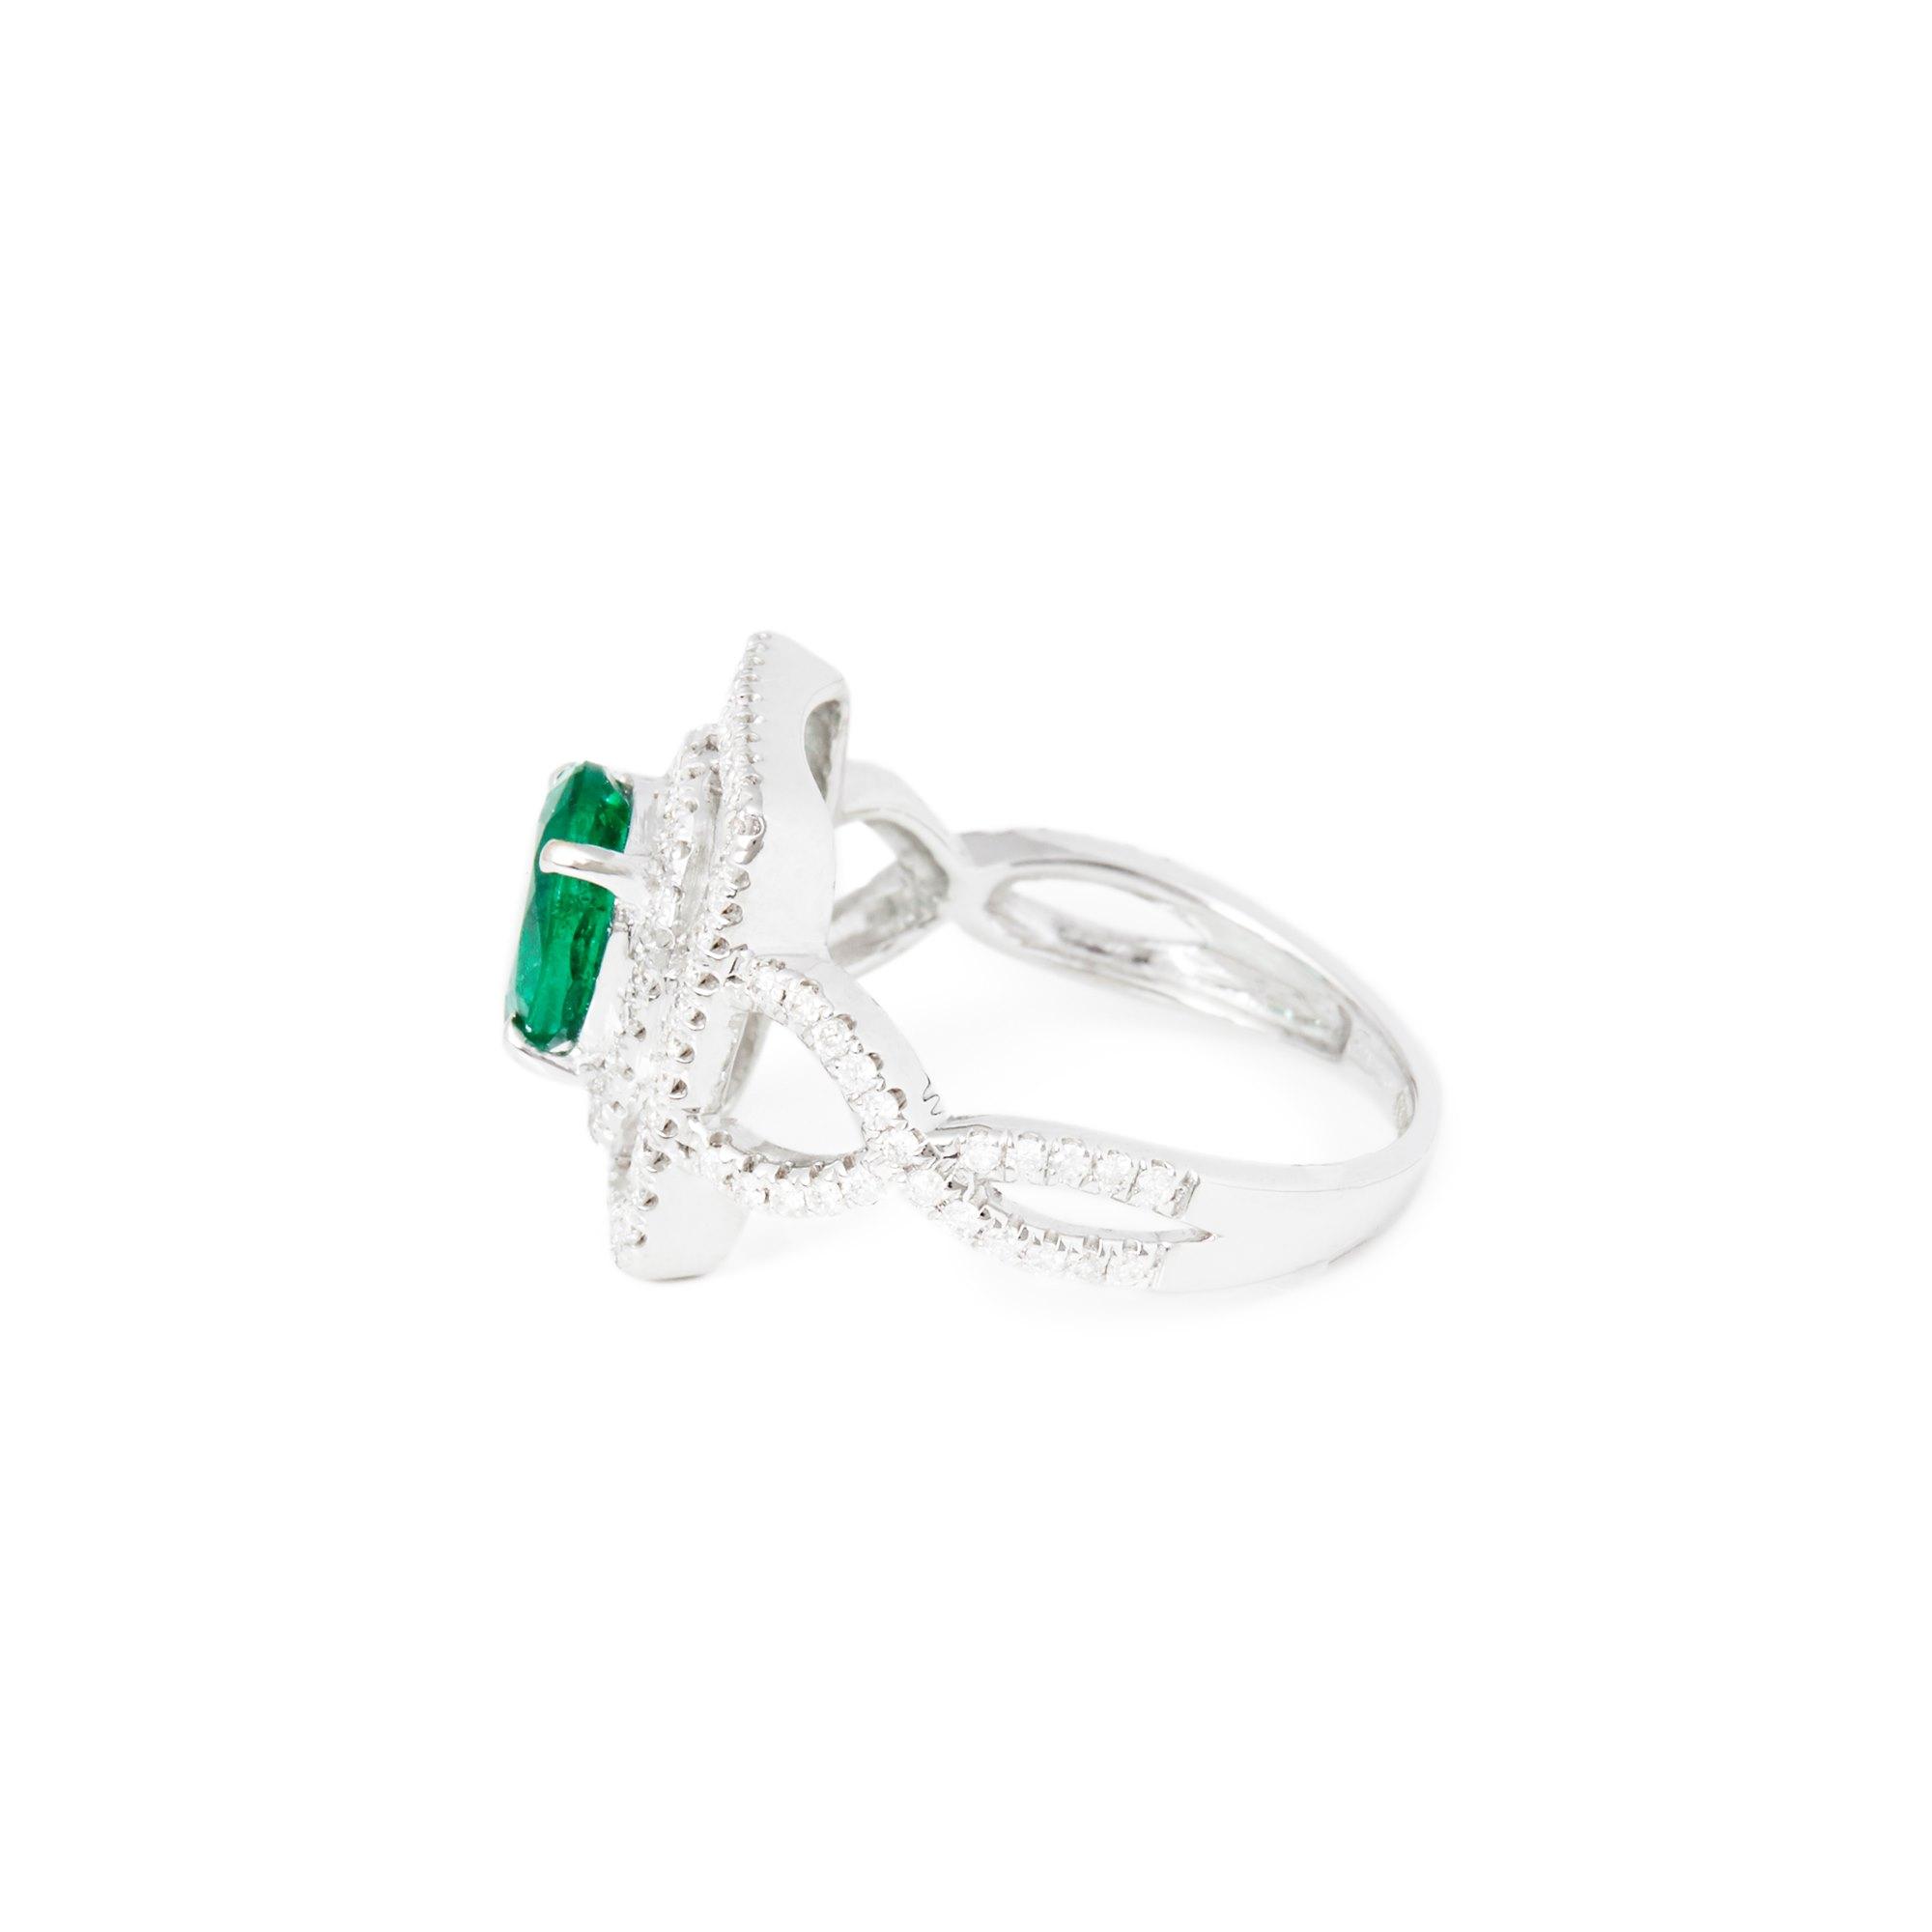 David Jerome Certified 1.58ct Untreated Zambian Oval Cut Emerald and Diamond 18ct gold Ring